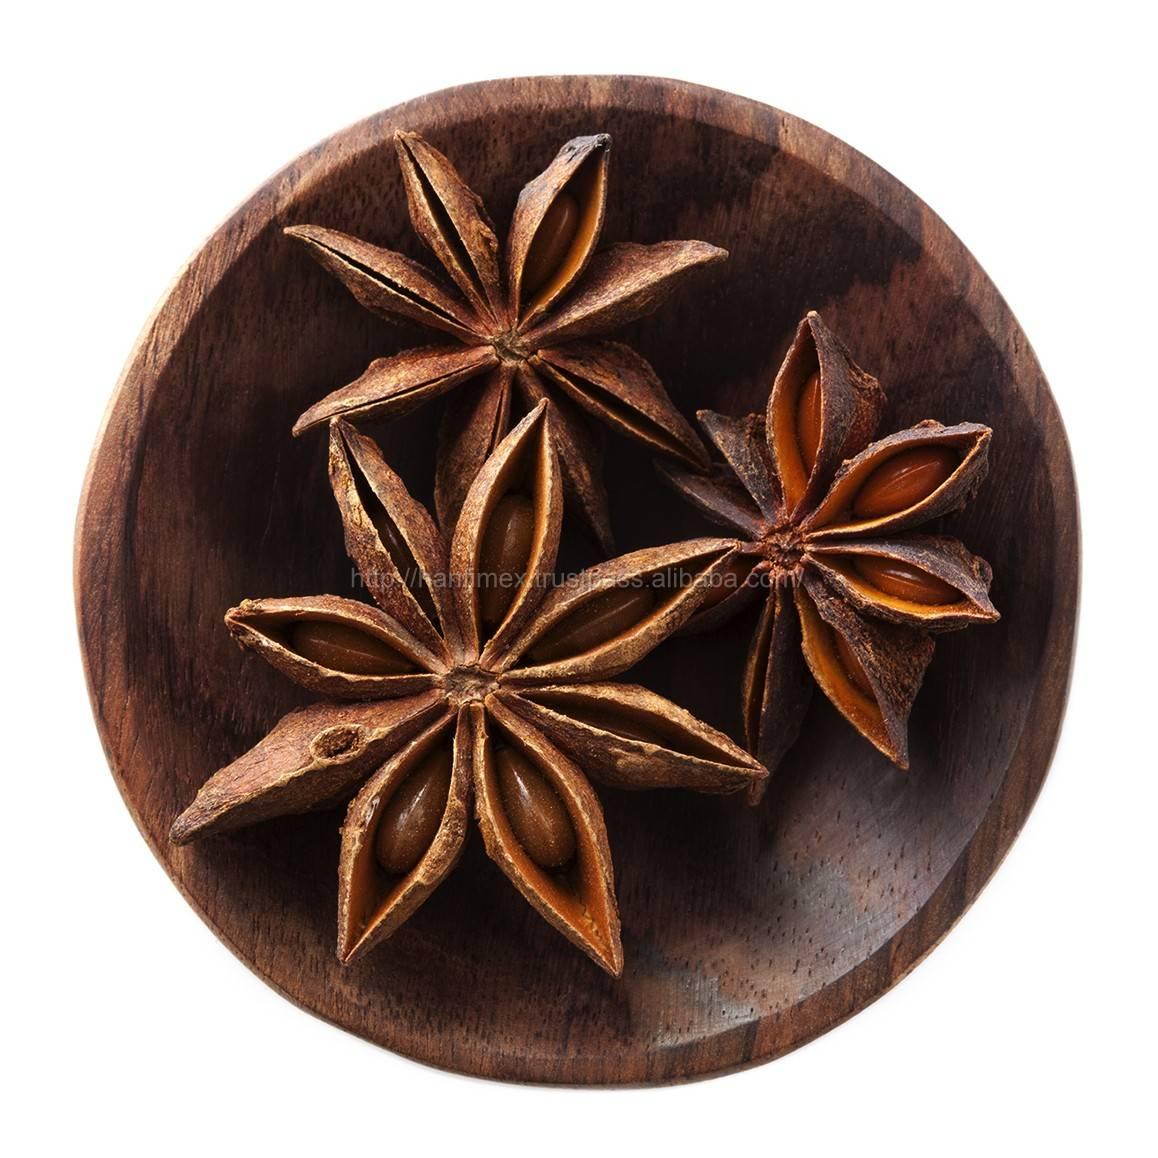 Vietnam Star Anise